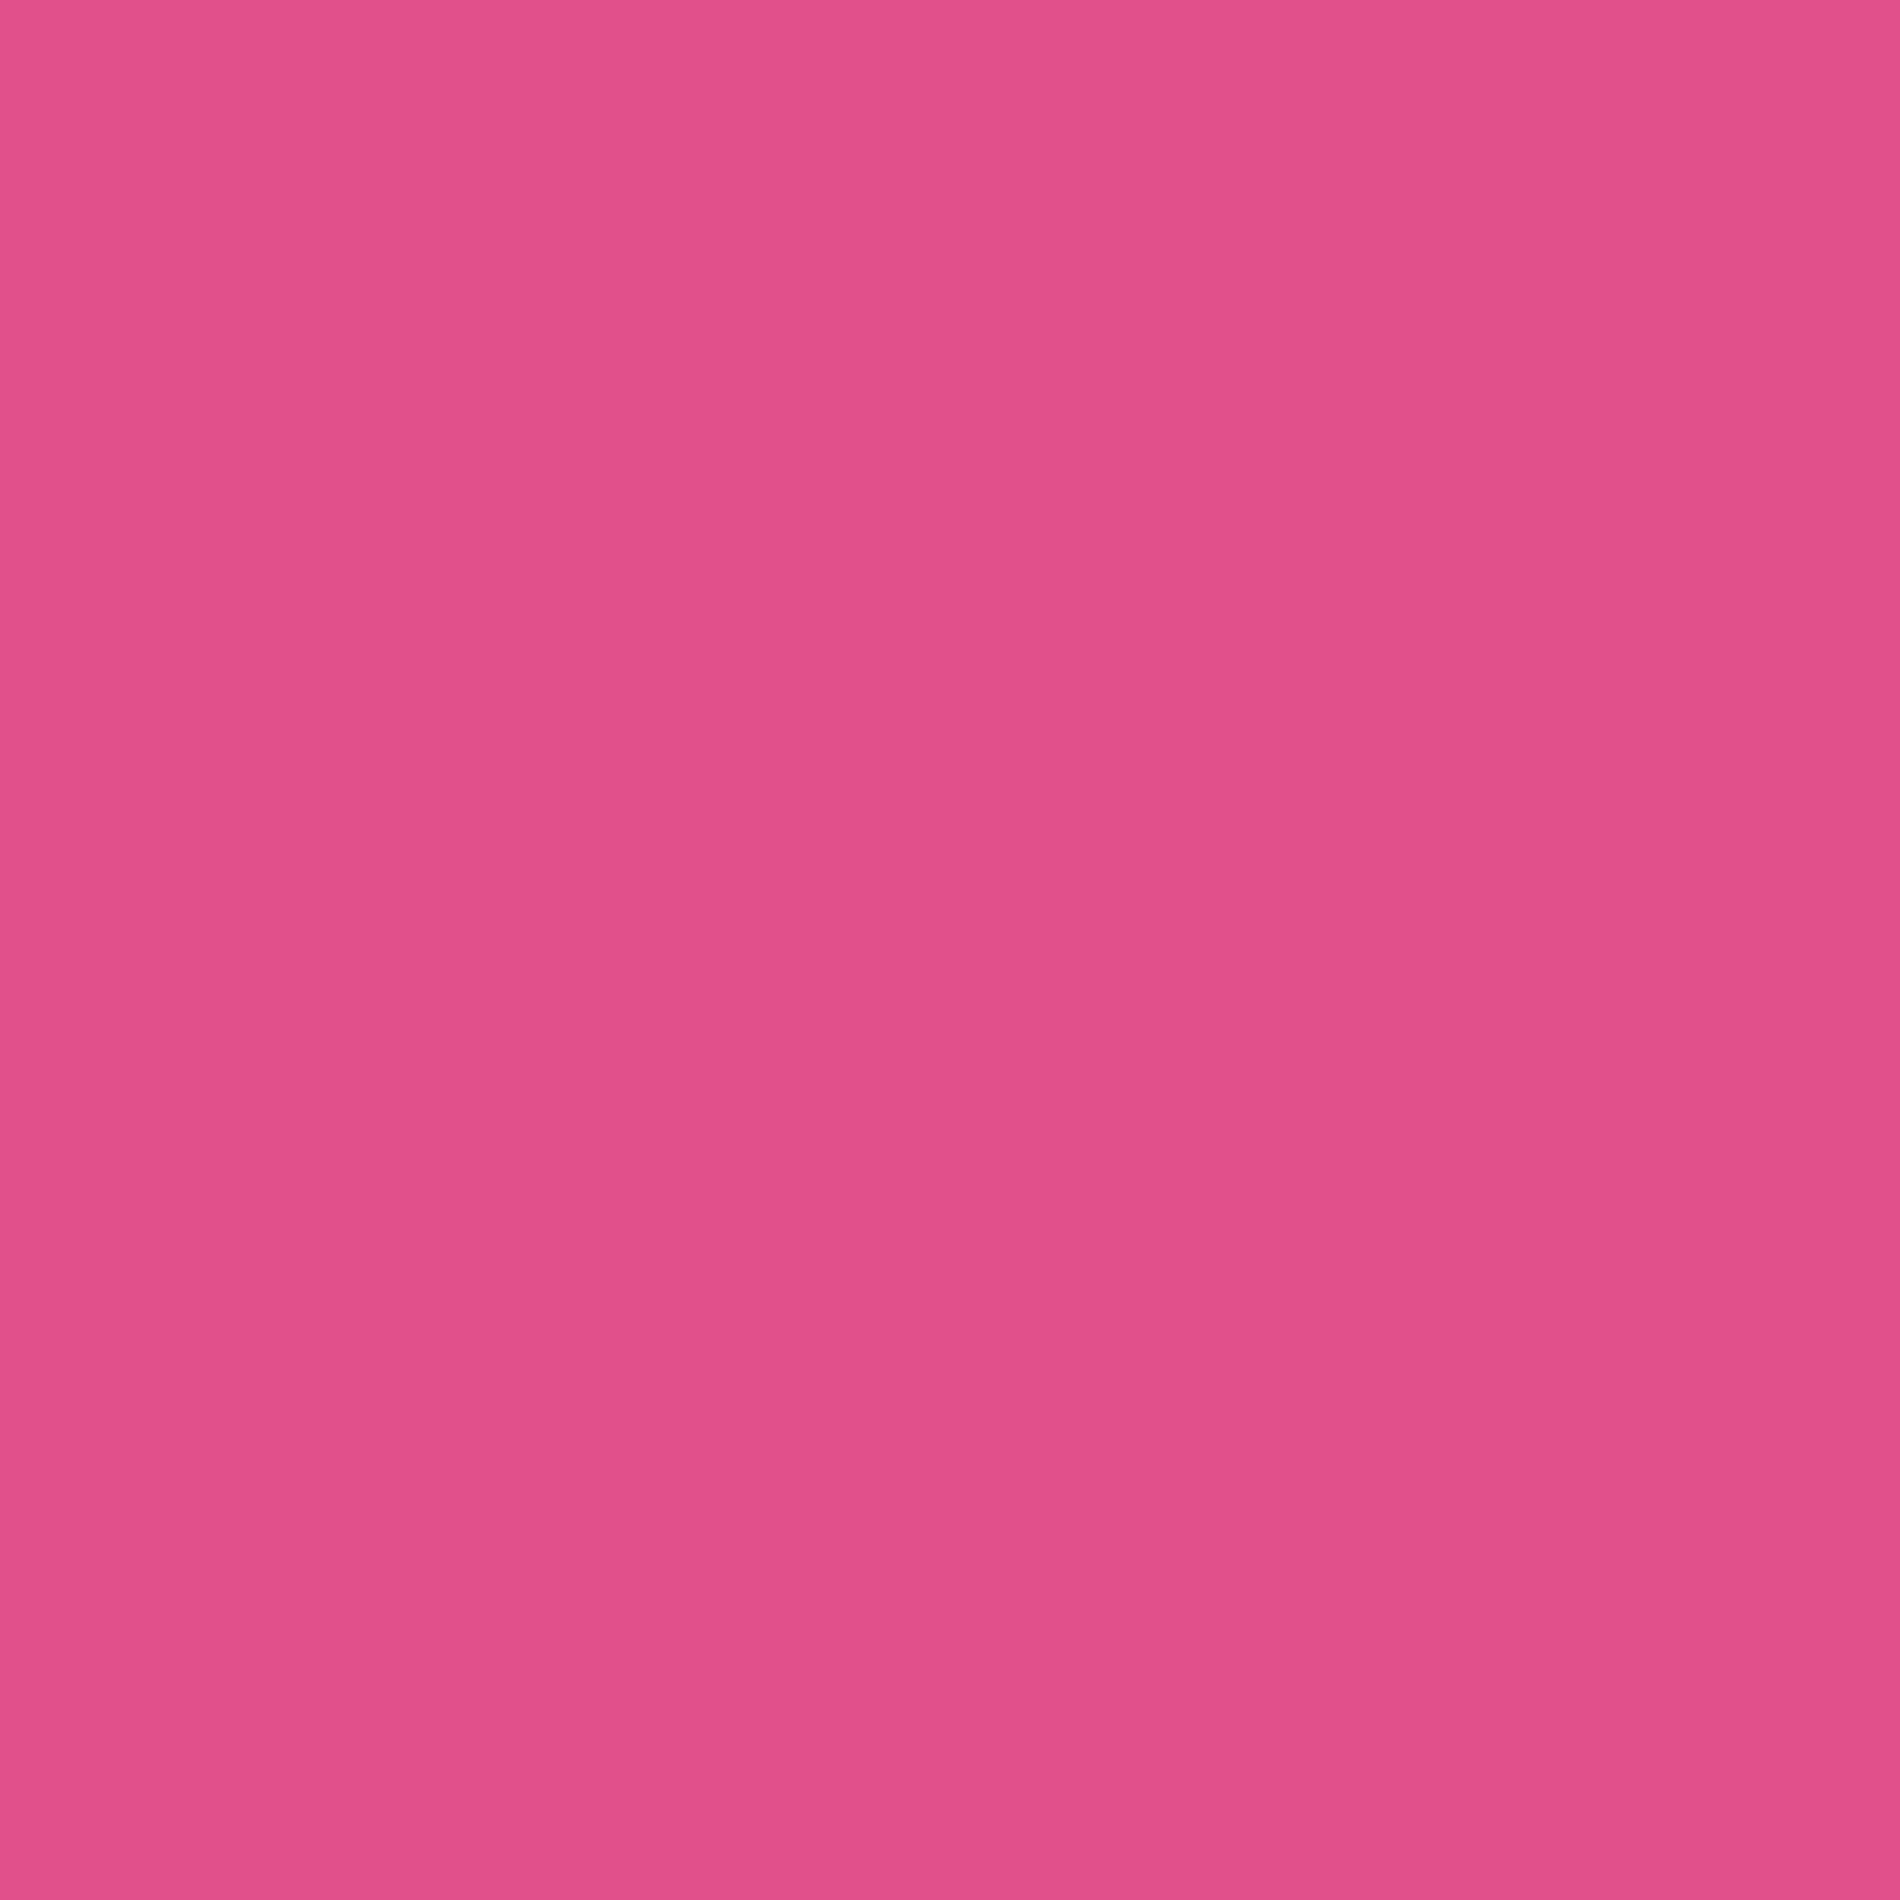 64 - pink